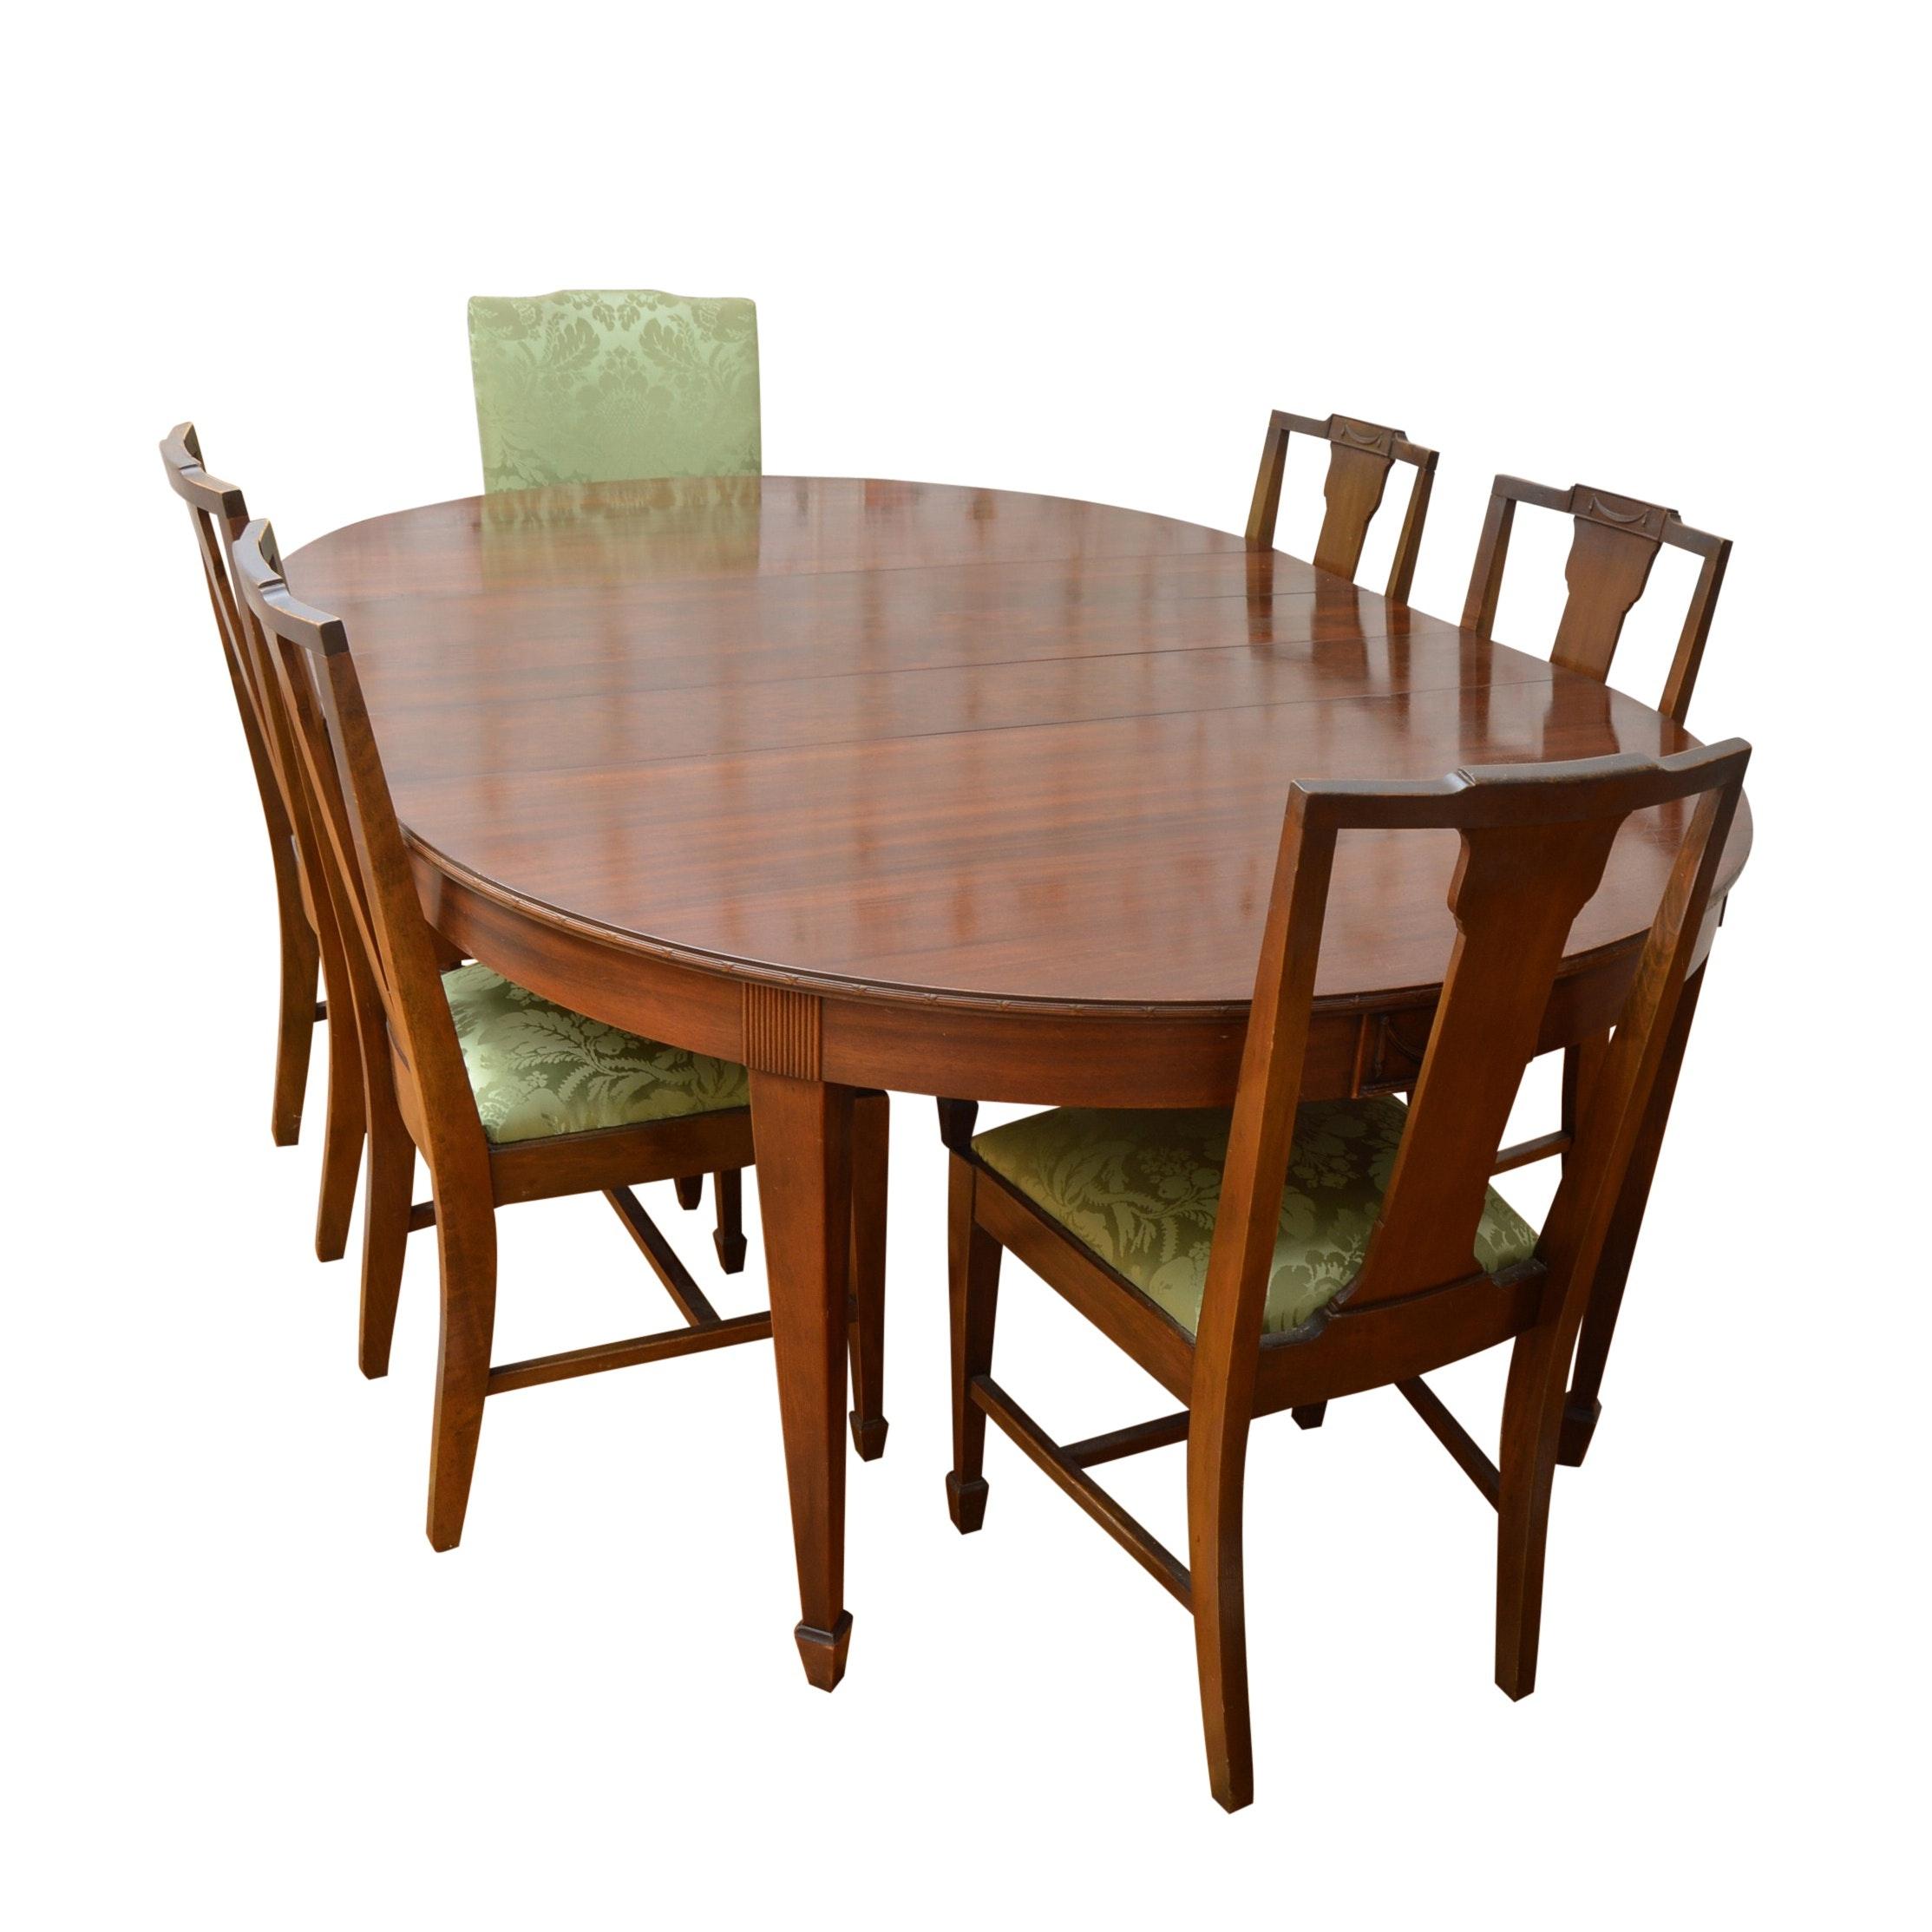 1920s Neoclassic Style Mahogany Dining Set